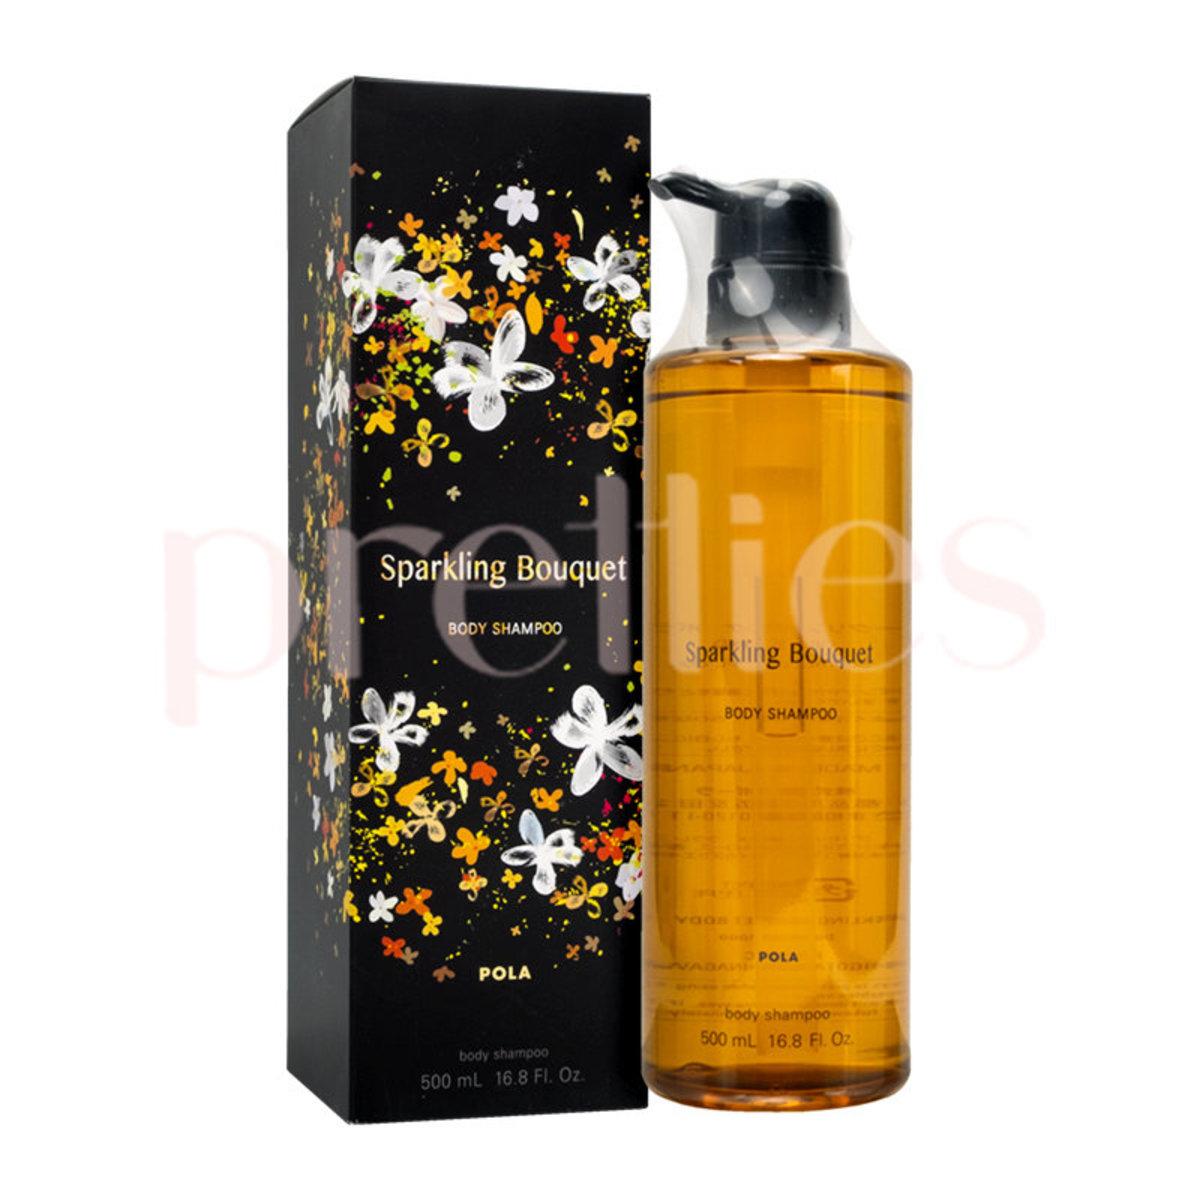 Sparkling Bouquet Body Shampoo 500ml (Parallel Import)